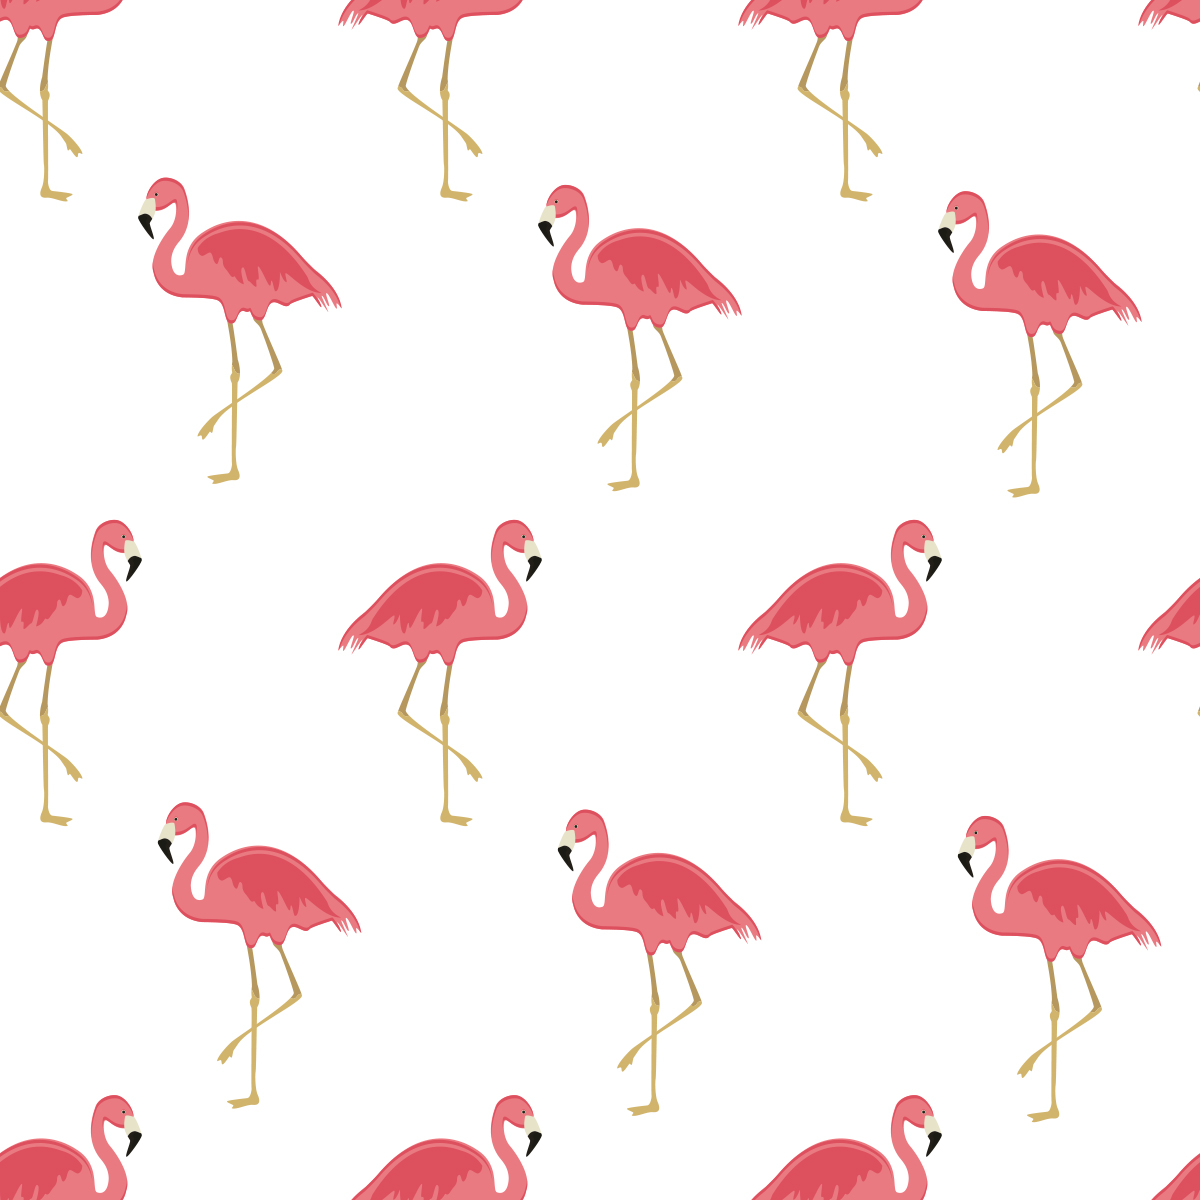 Papel de Parede Flamingo Glamour Adesivo